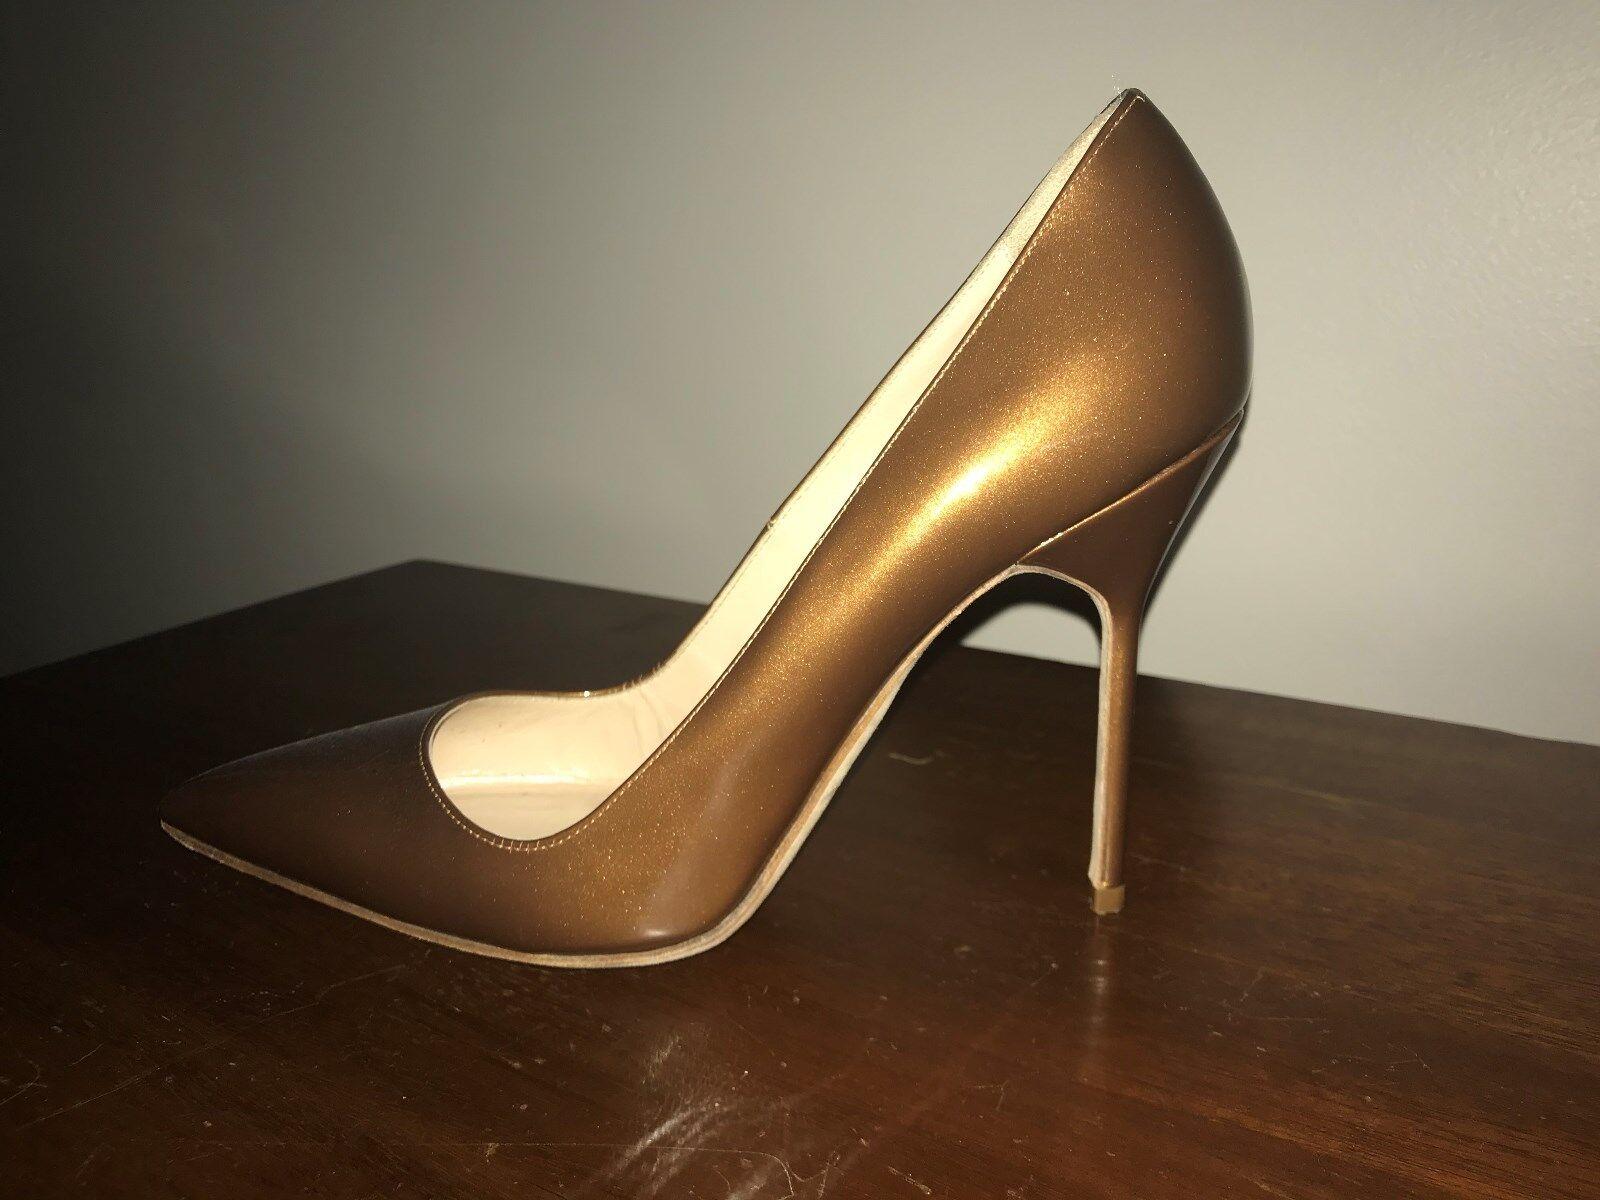 Manolo Manolo Manolo Blanik marron Bronze Patent Leather High Heel Pumps Taille 39 US 8.5 9b0e03